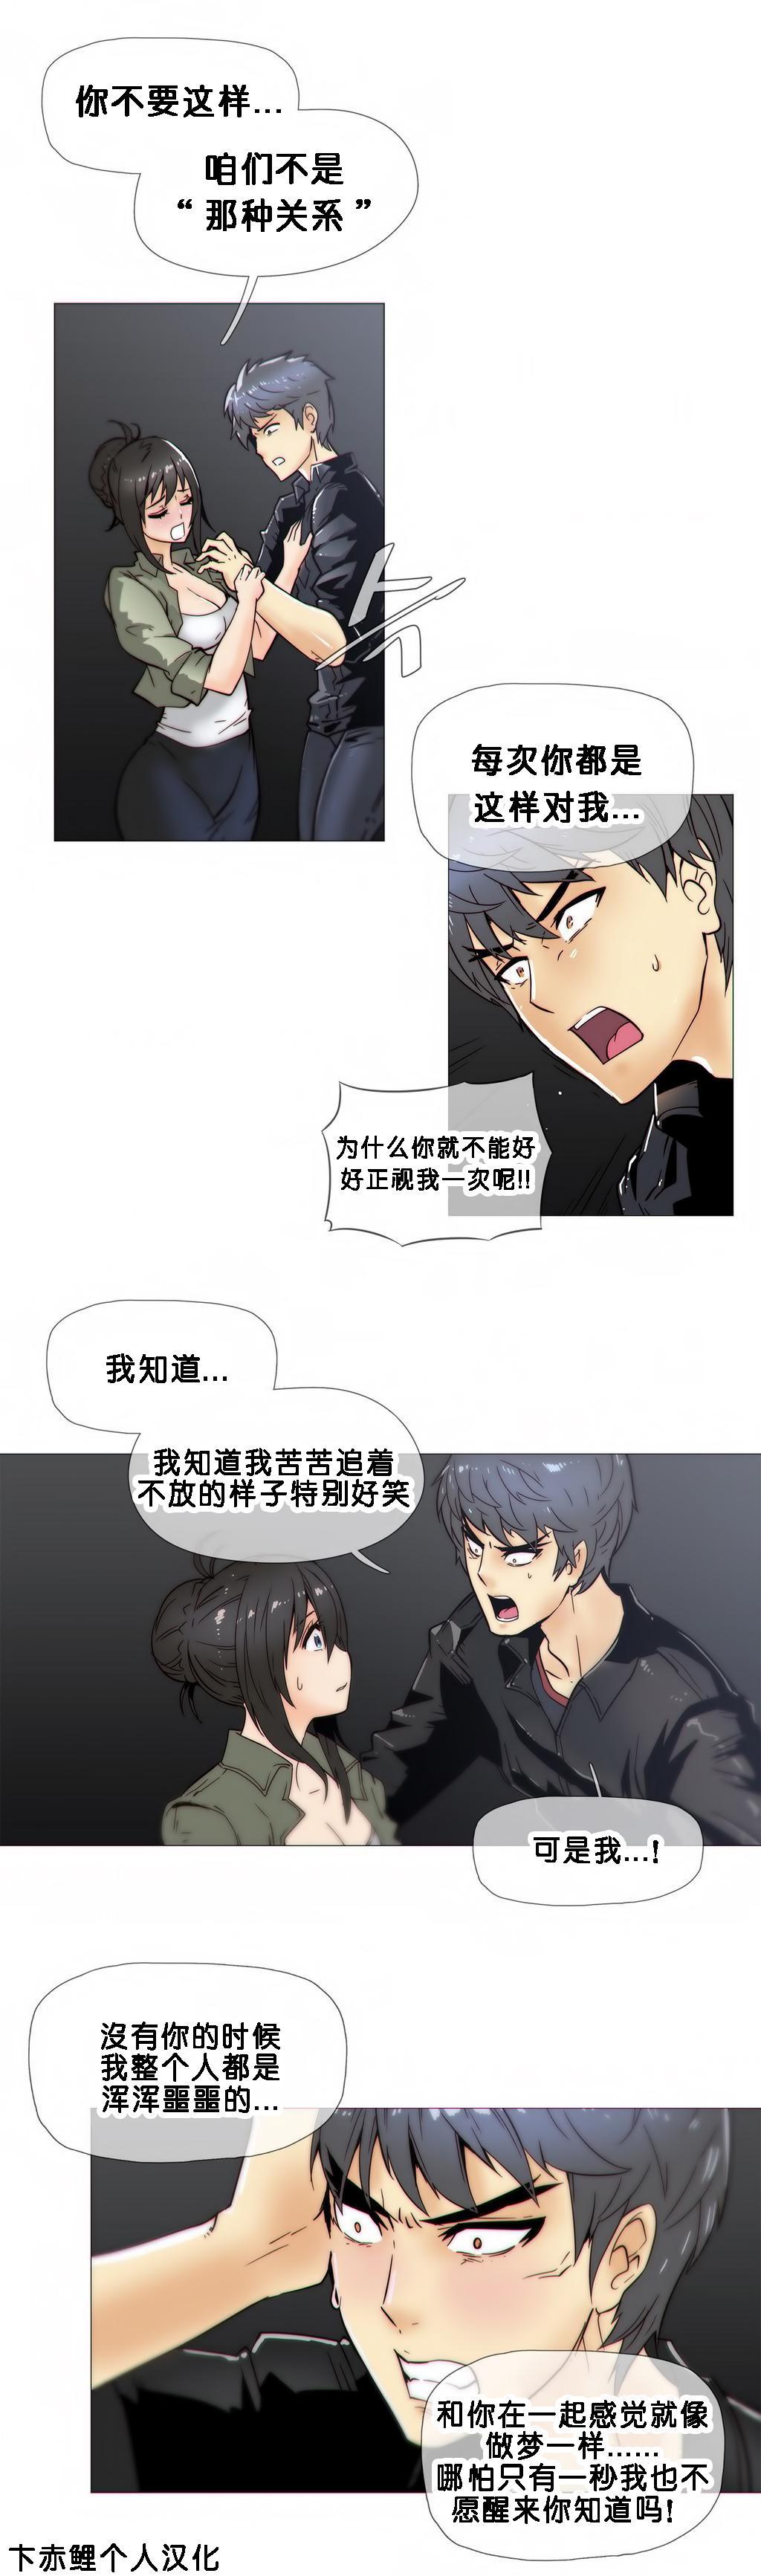 HouseHold Affairs 【卞赤鲤个人汉化】1~21话(持续更新中) 475